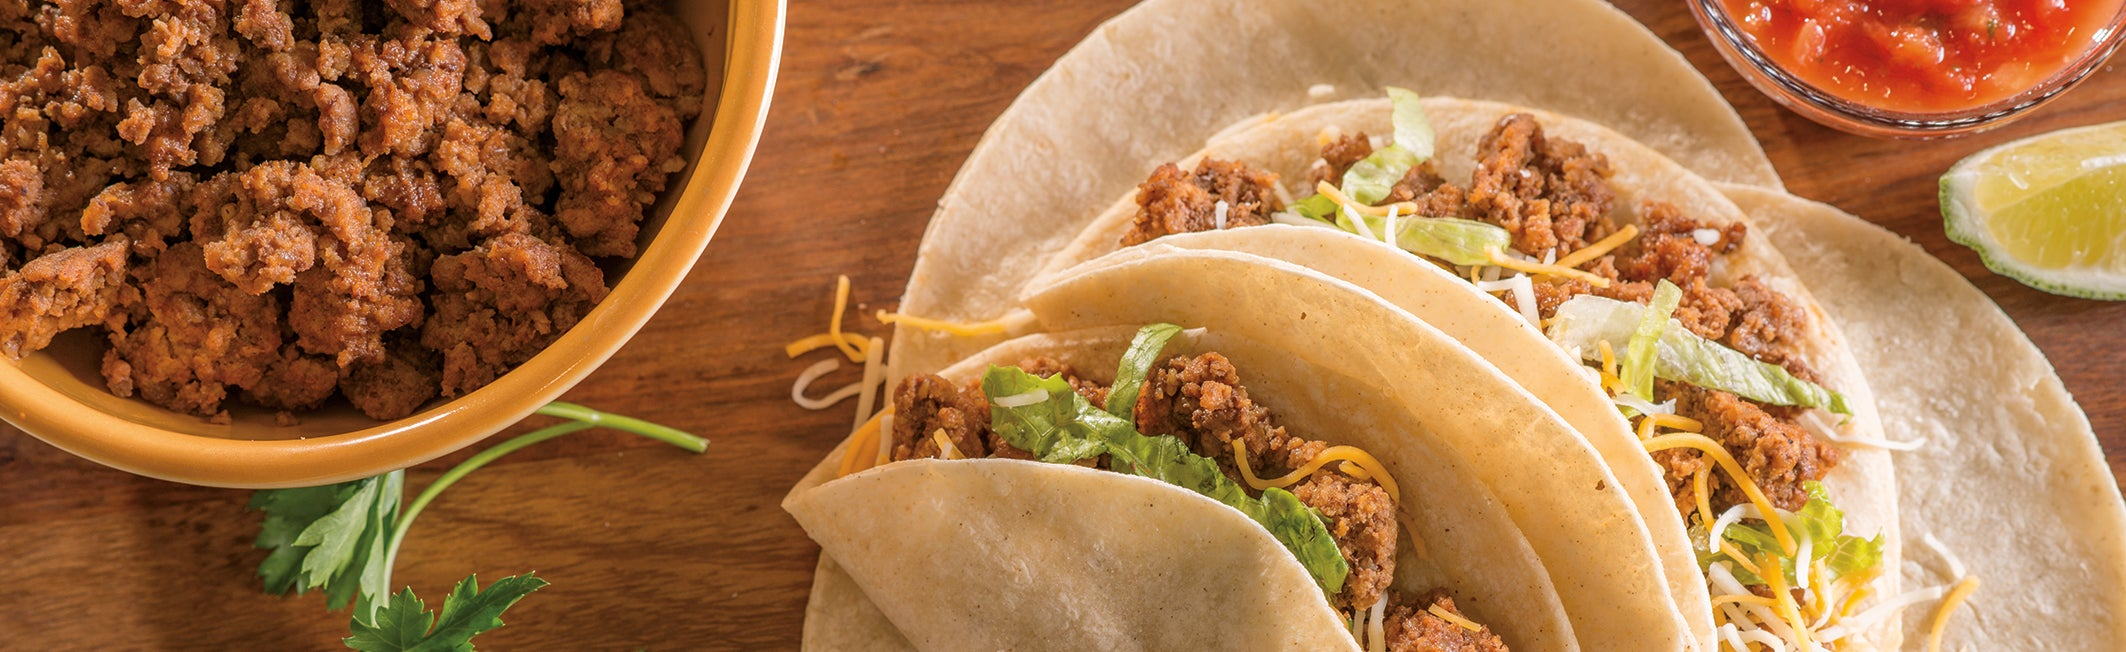 taco bar menu ideas